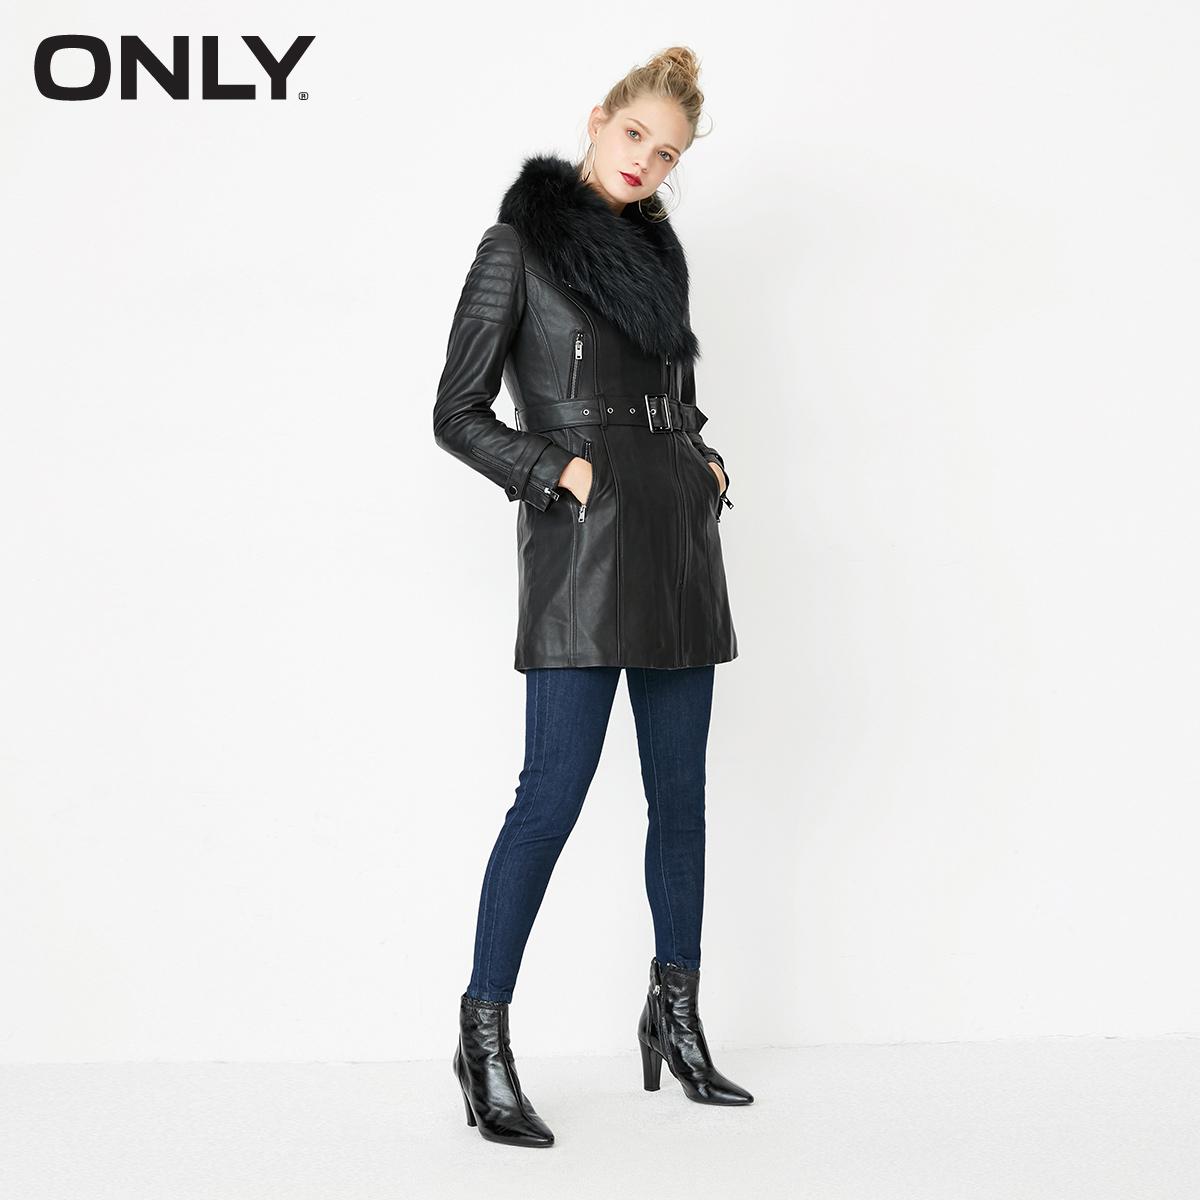 ONLY秋冬新款绵羊皮修身长款夹棉皮衣女|117428506